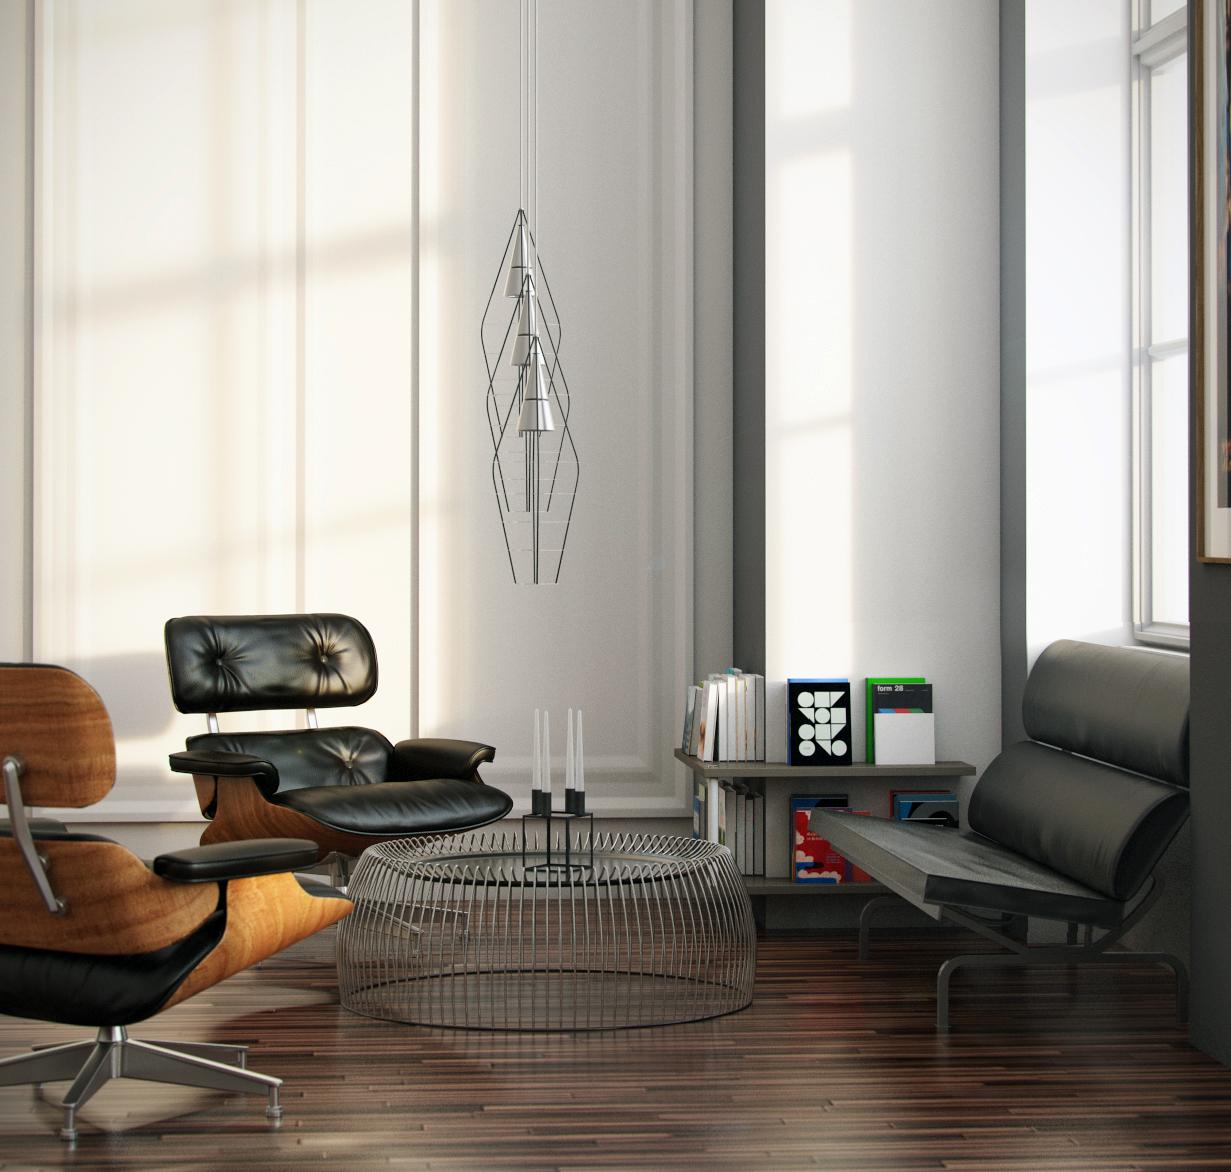 Cg m arket3d hdri lighting for realistic rendering for Vray interior